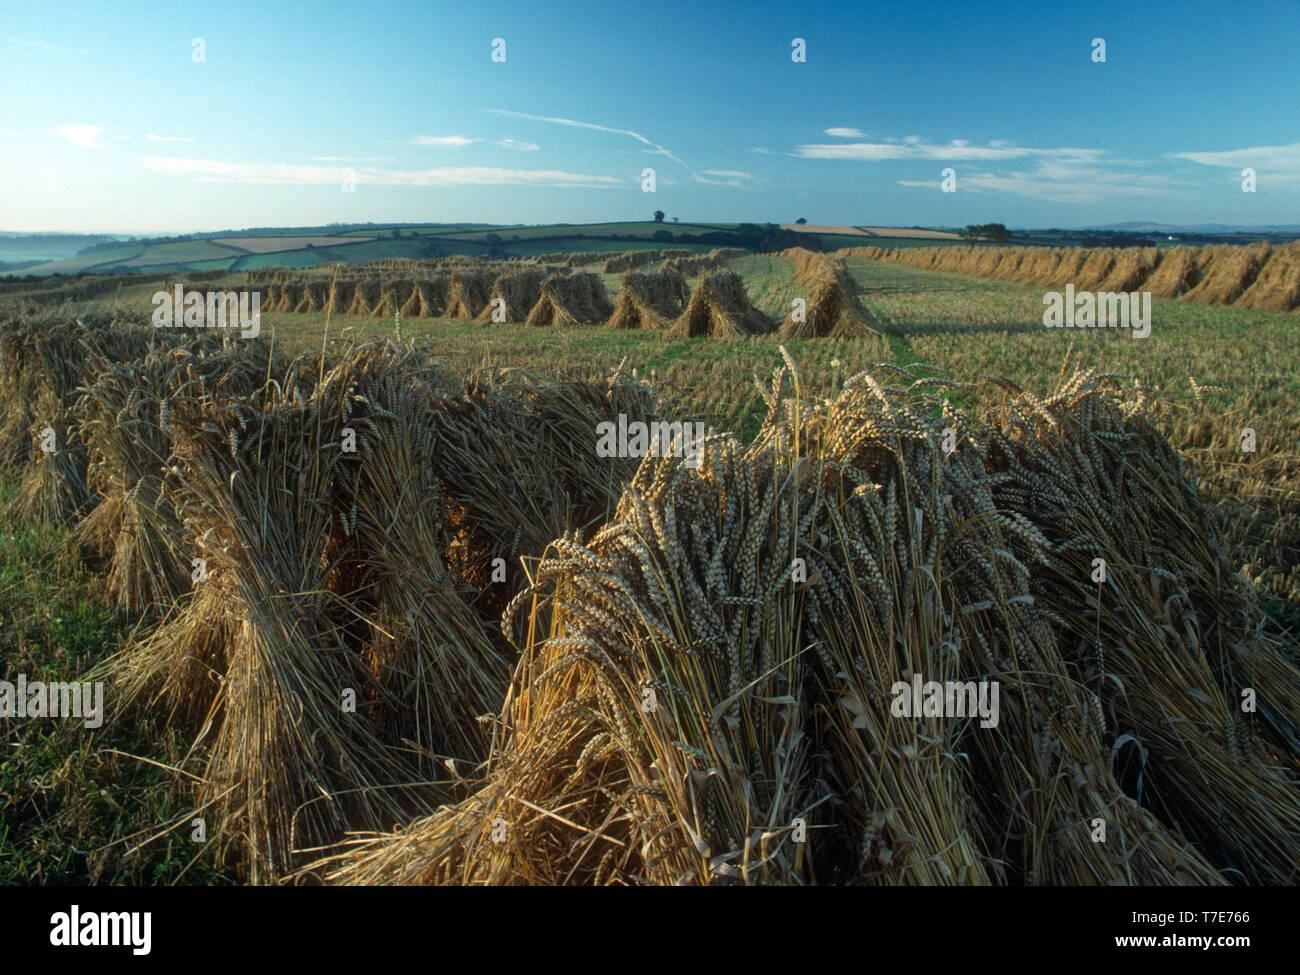 Stooks of wheat for Thatching, Devon, UK - Stock Image